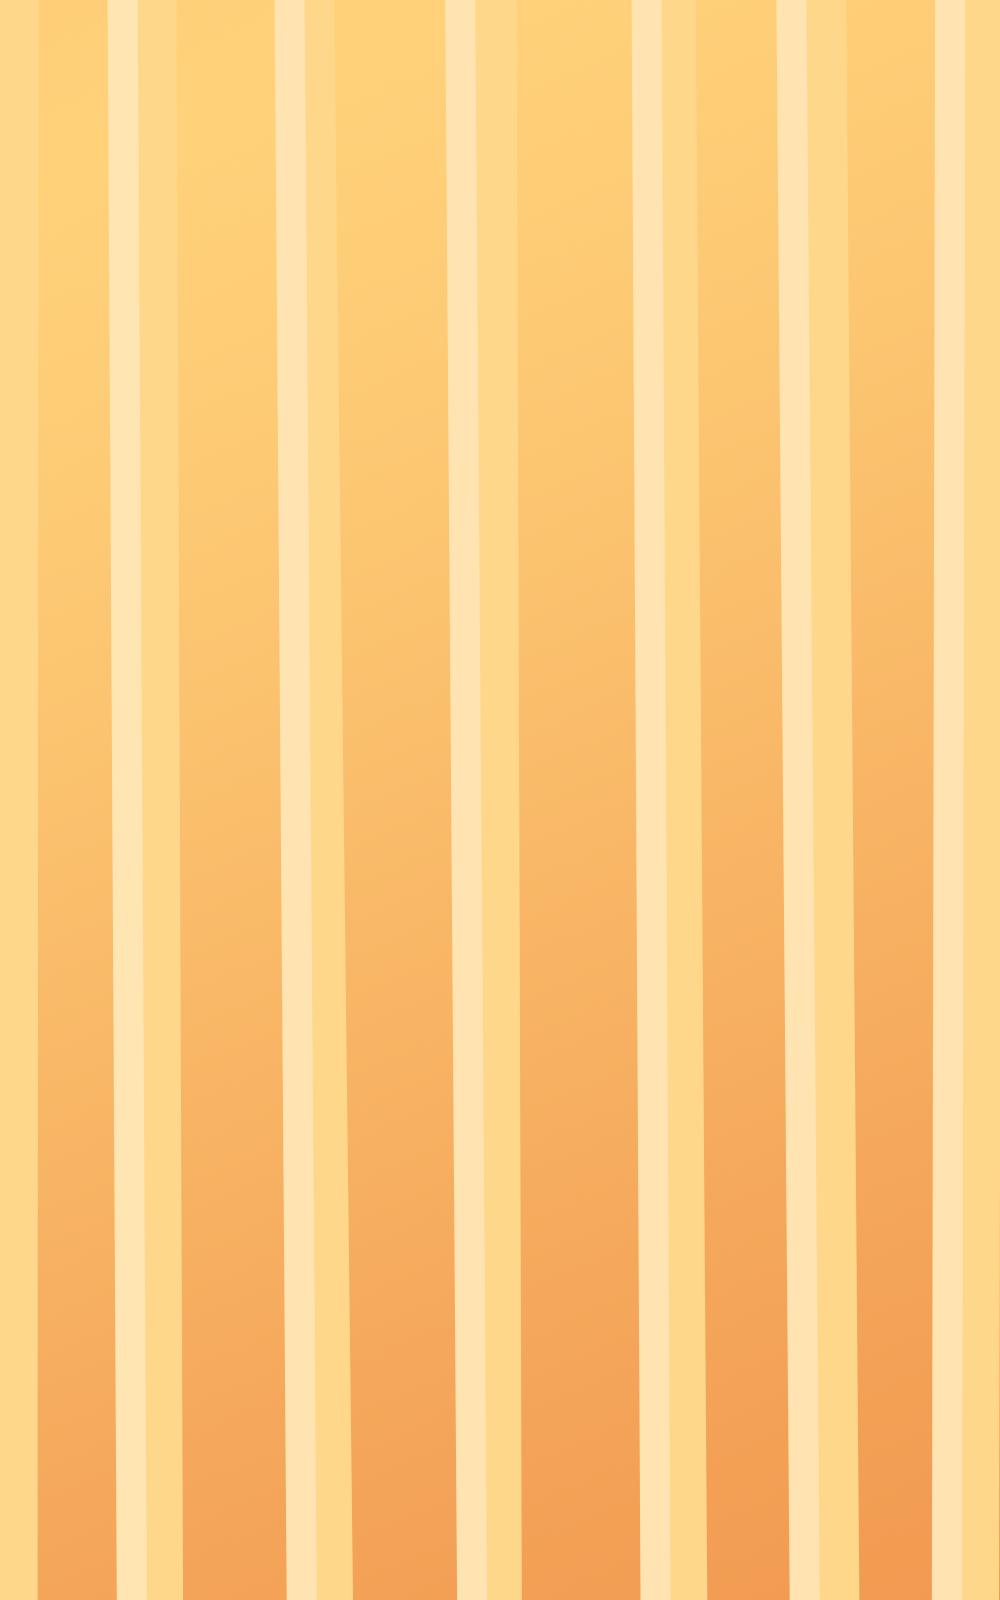 Orange stripes custom background by lonehuntress